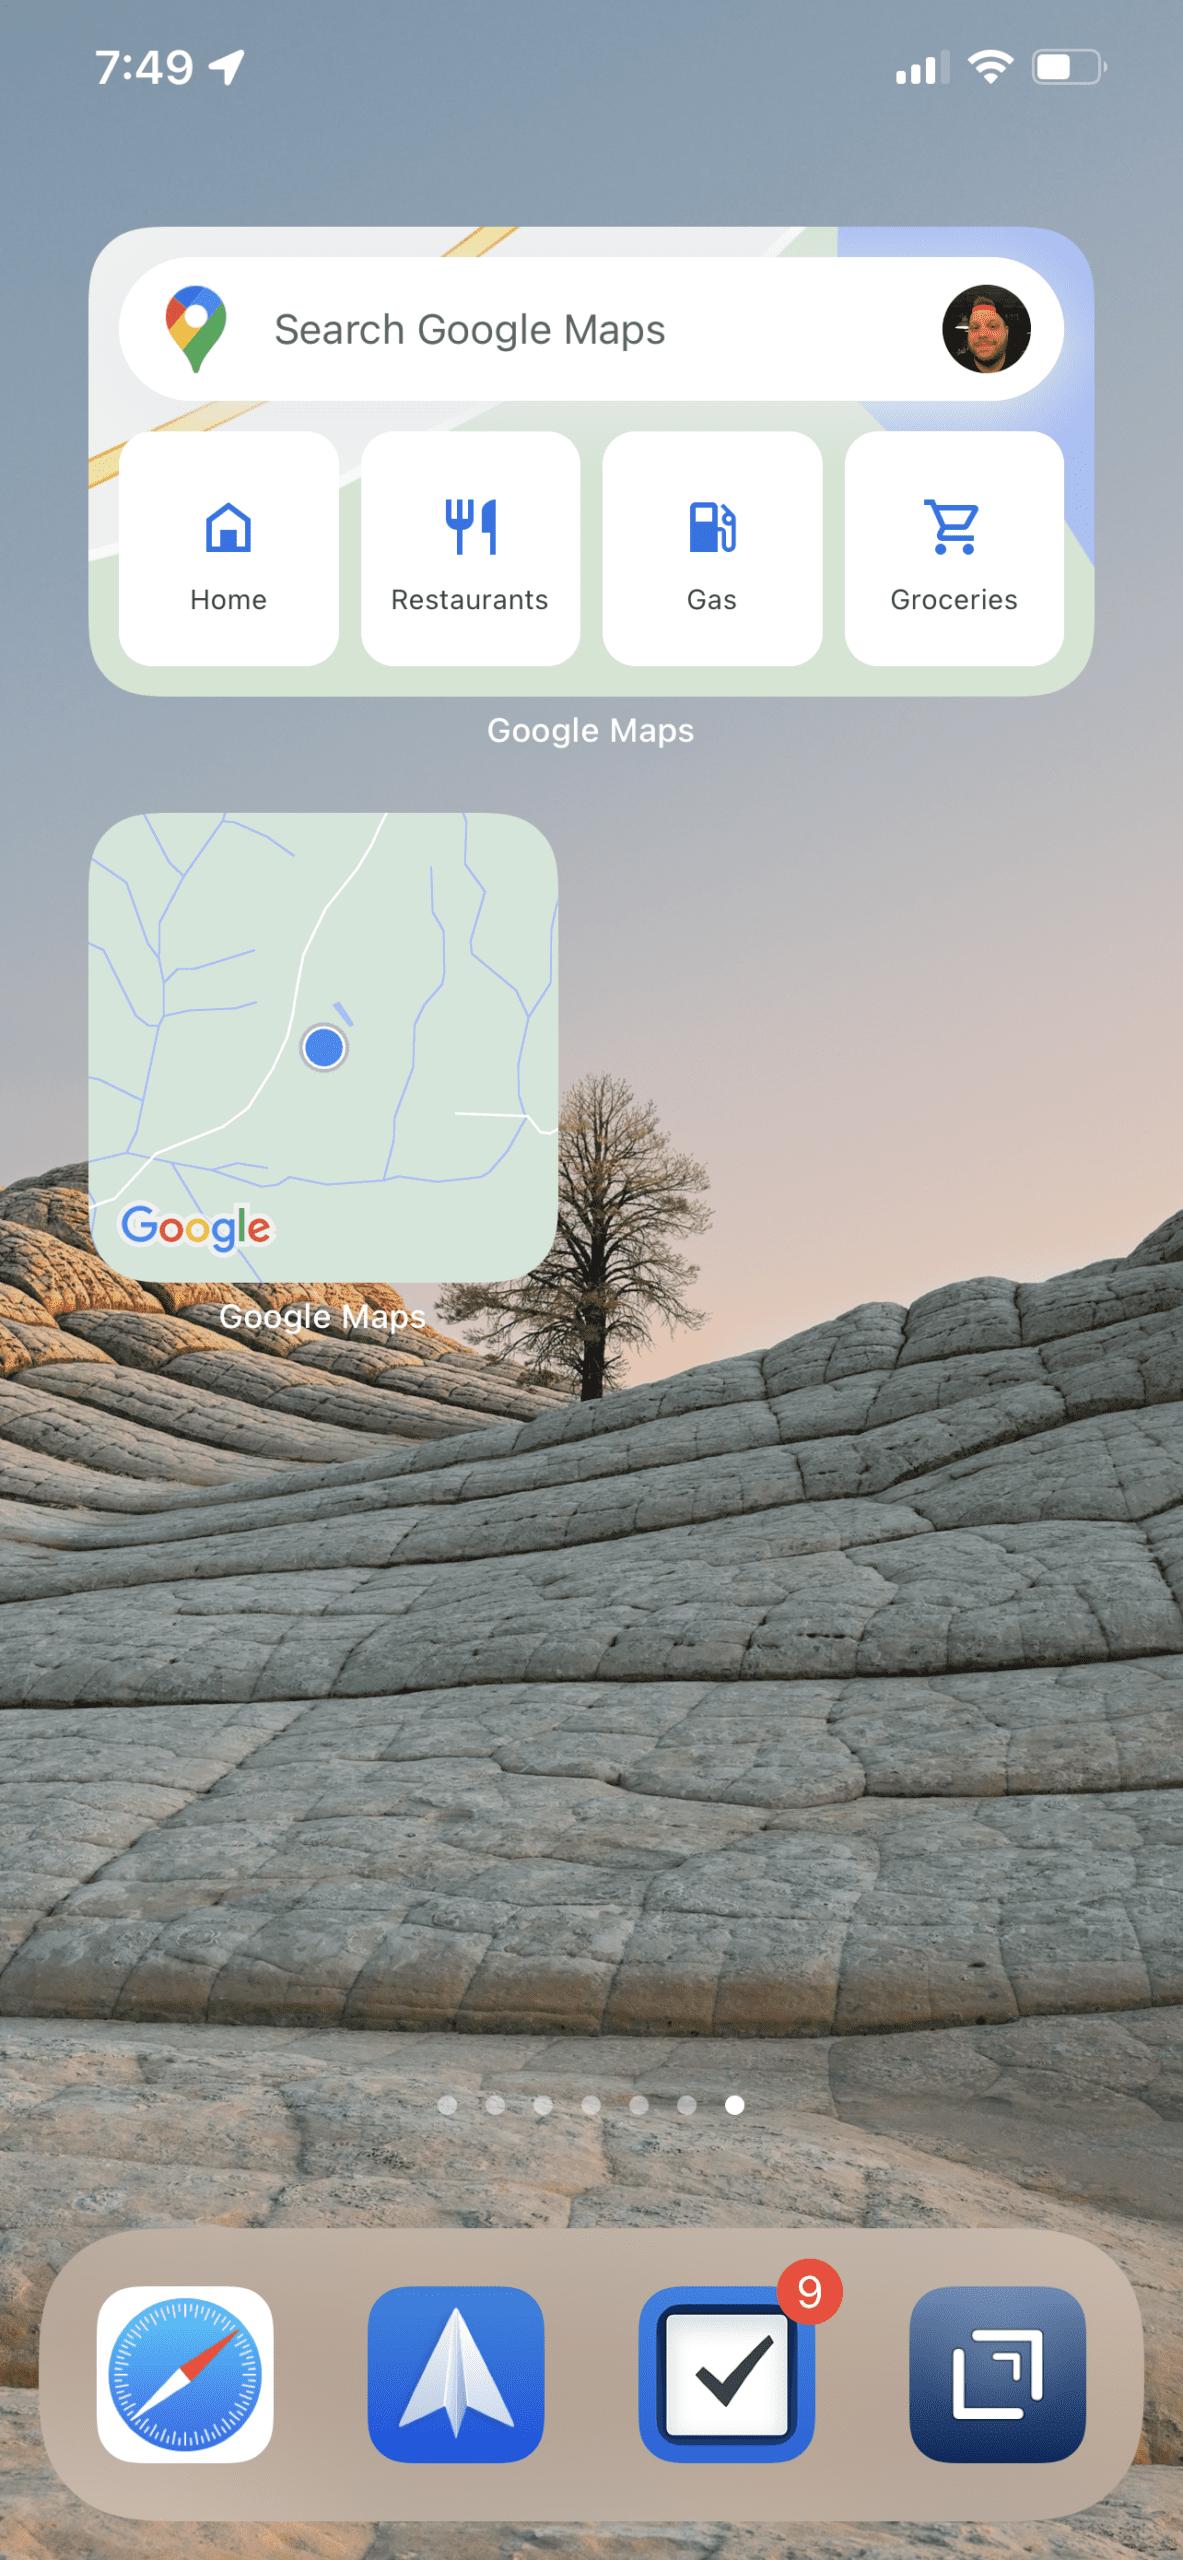 Use Google Maps Widget on iPhone 4